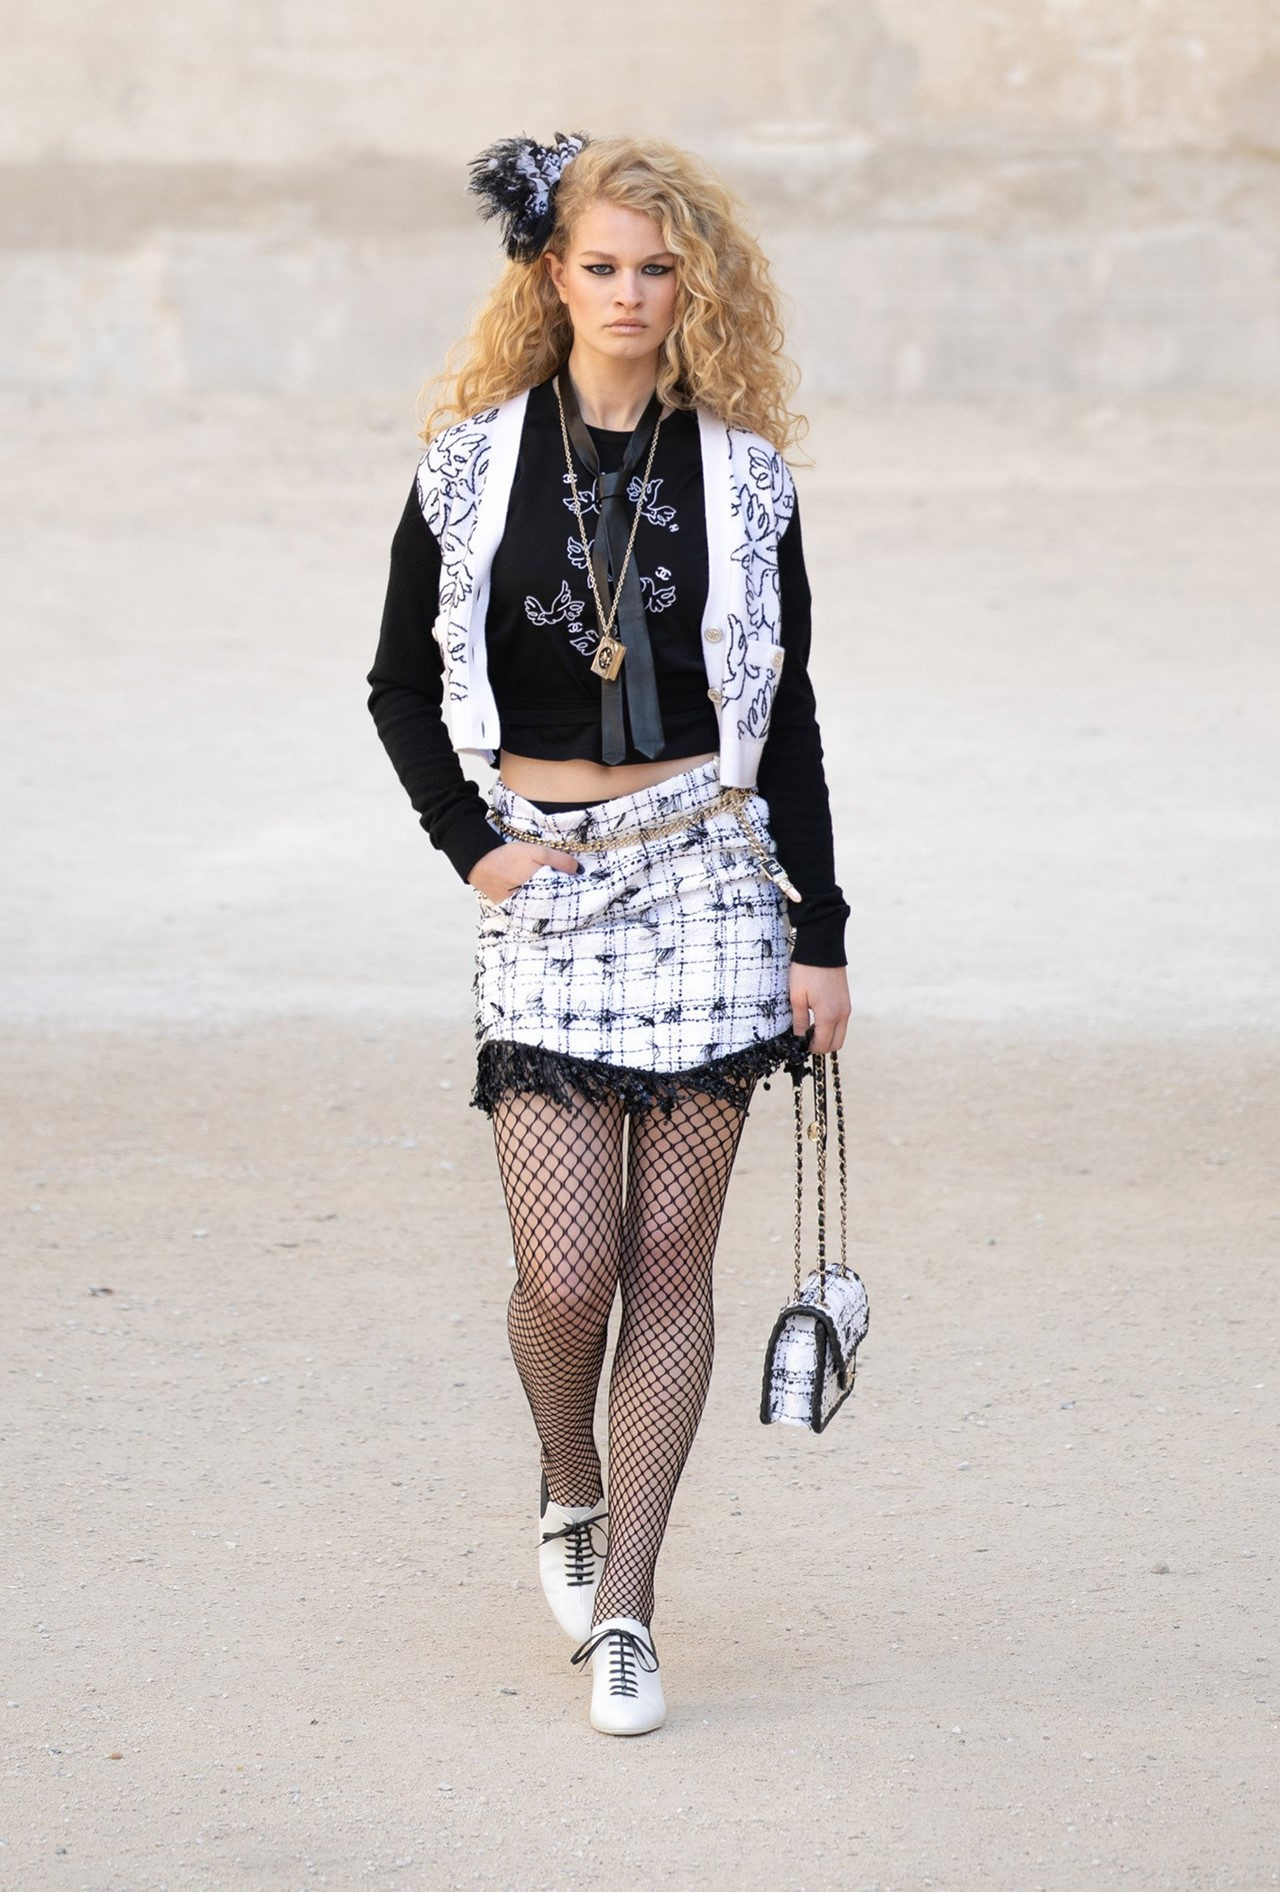 Chanel_Cruise_2022_Fashionela (22)